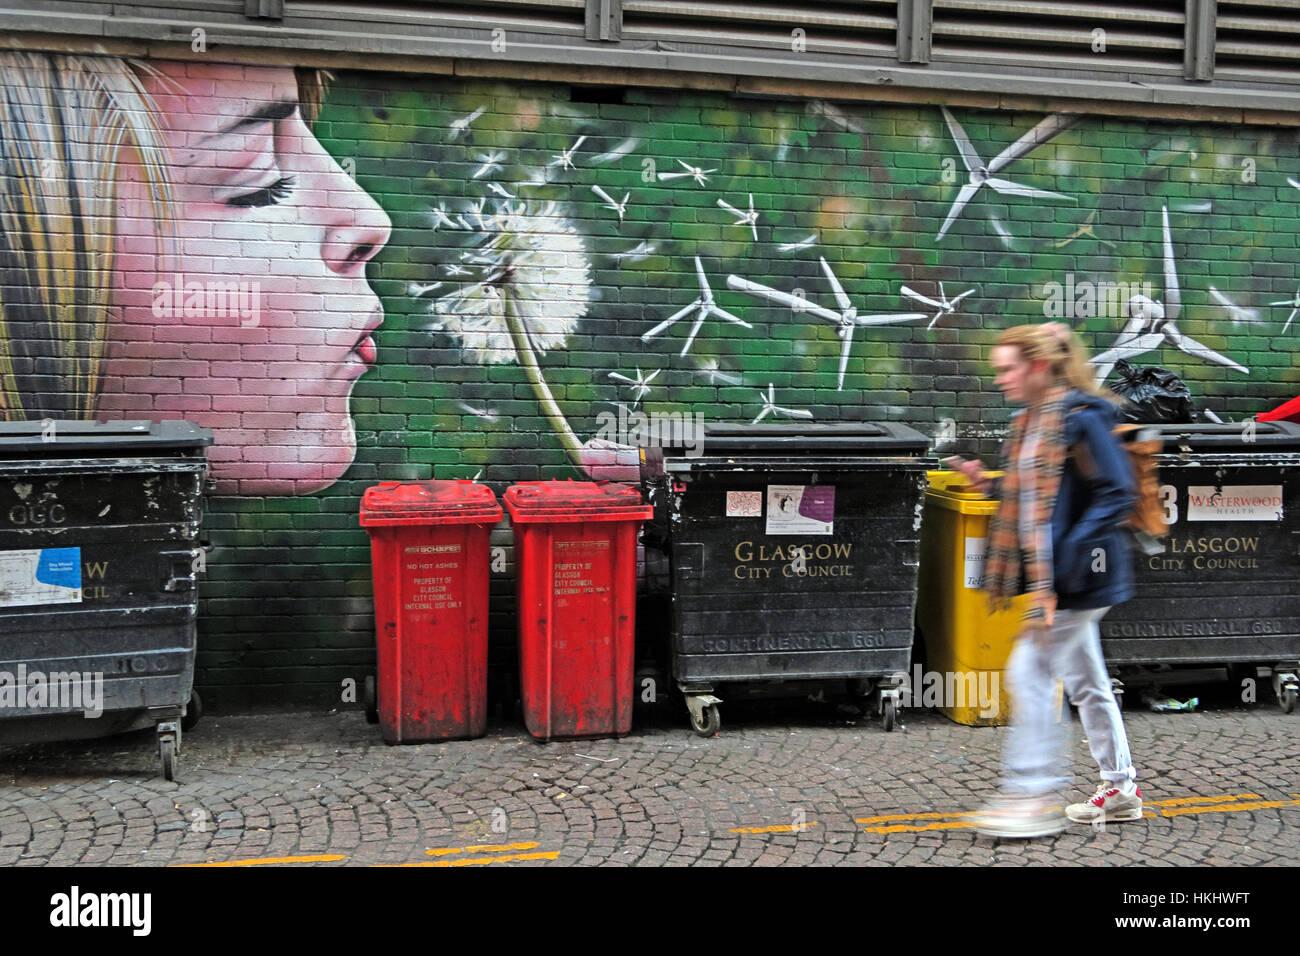 eco,bin,waste,Flower,dandelion,red,red bins,art,urban art,lips,face,blond,blond girl,recycling,recycle,Glasgow City Council,GoTonySmith,Scottish,collections,wheelie bins,wheeliebins